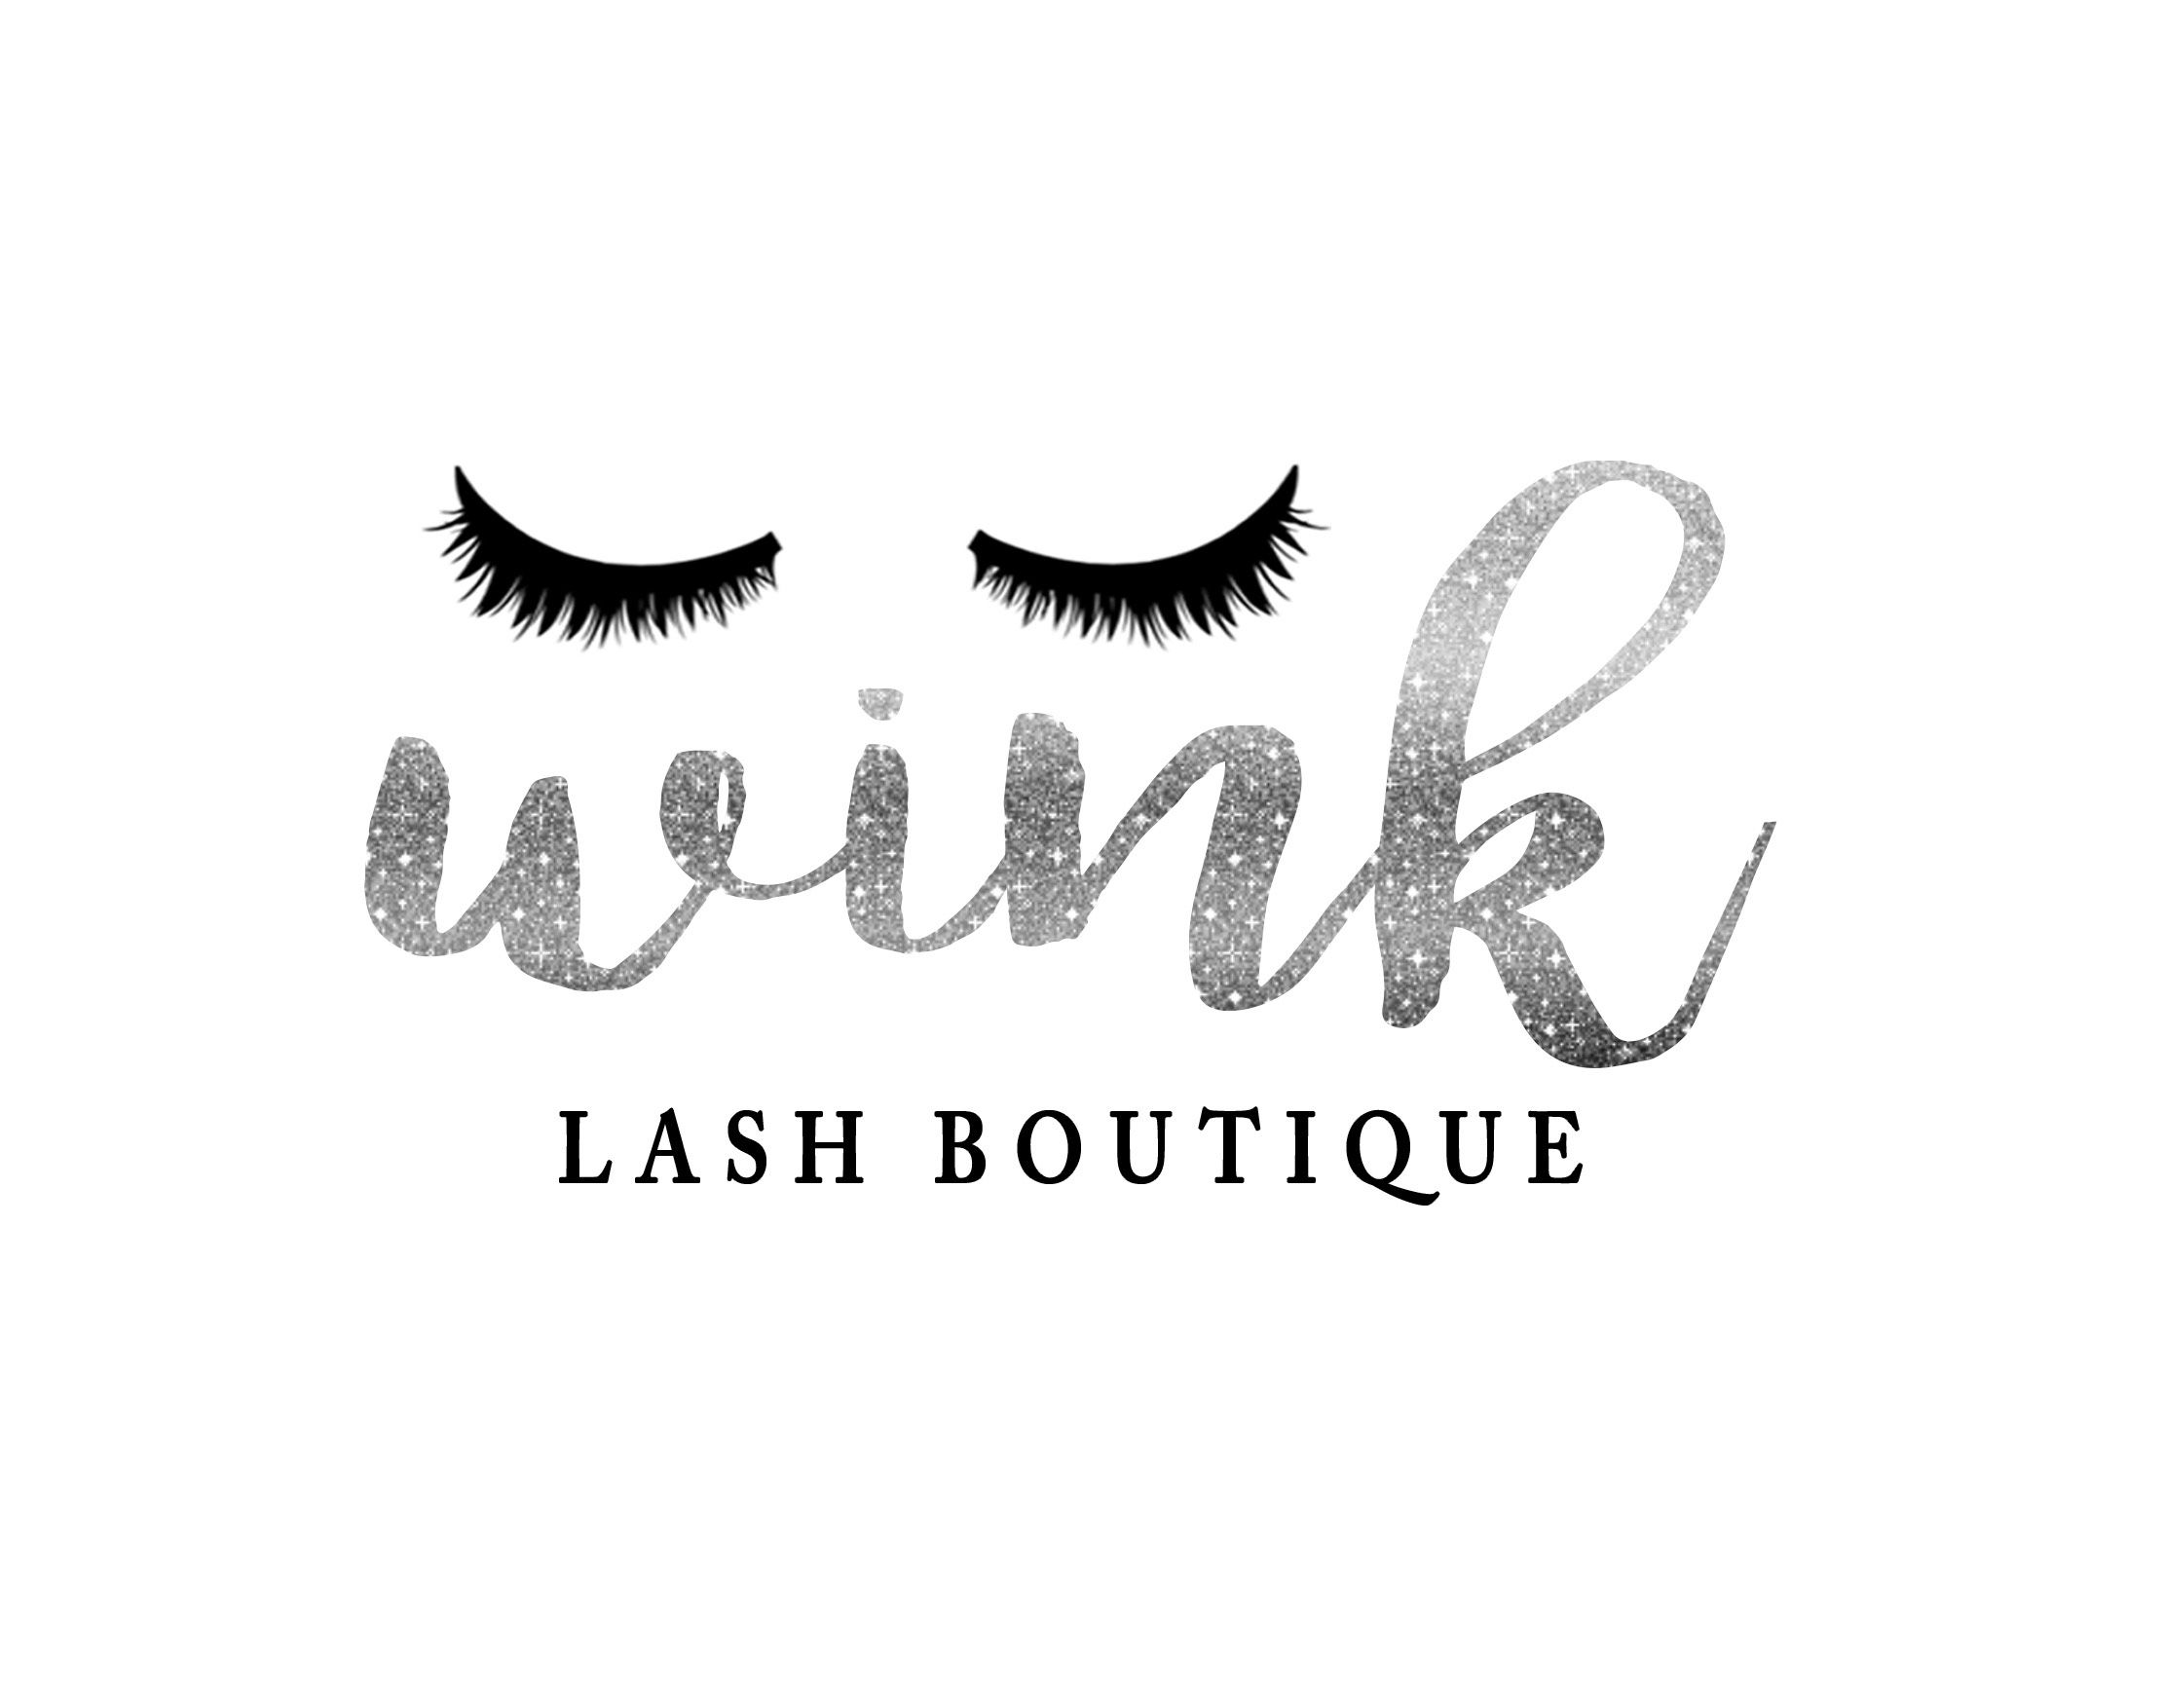 Wink Lash Boutique In Chicopee Ma Vagaro Lashes Lashes Logo